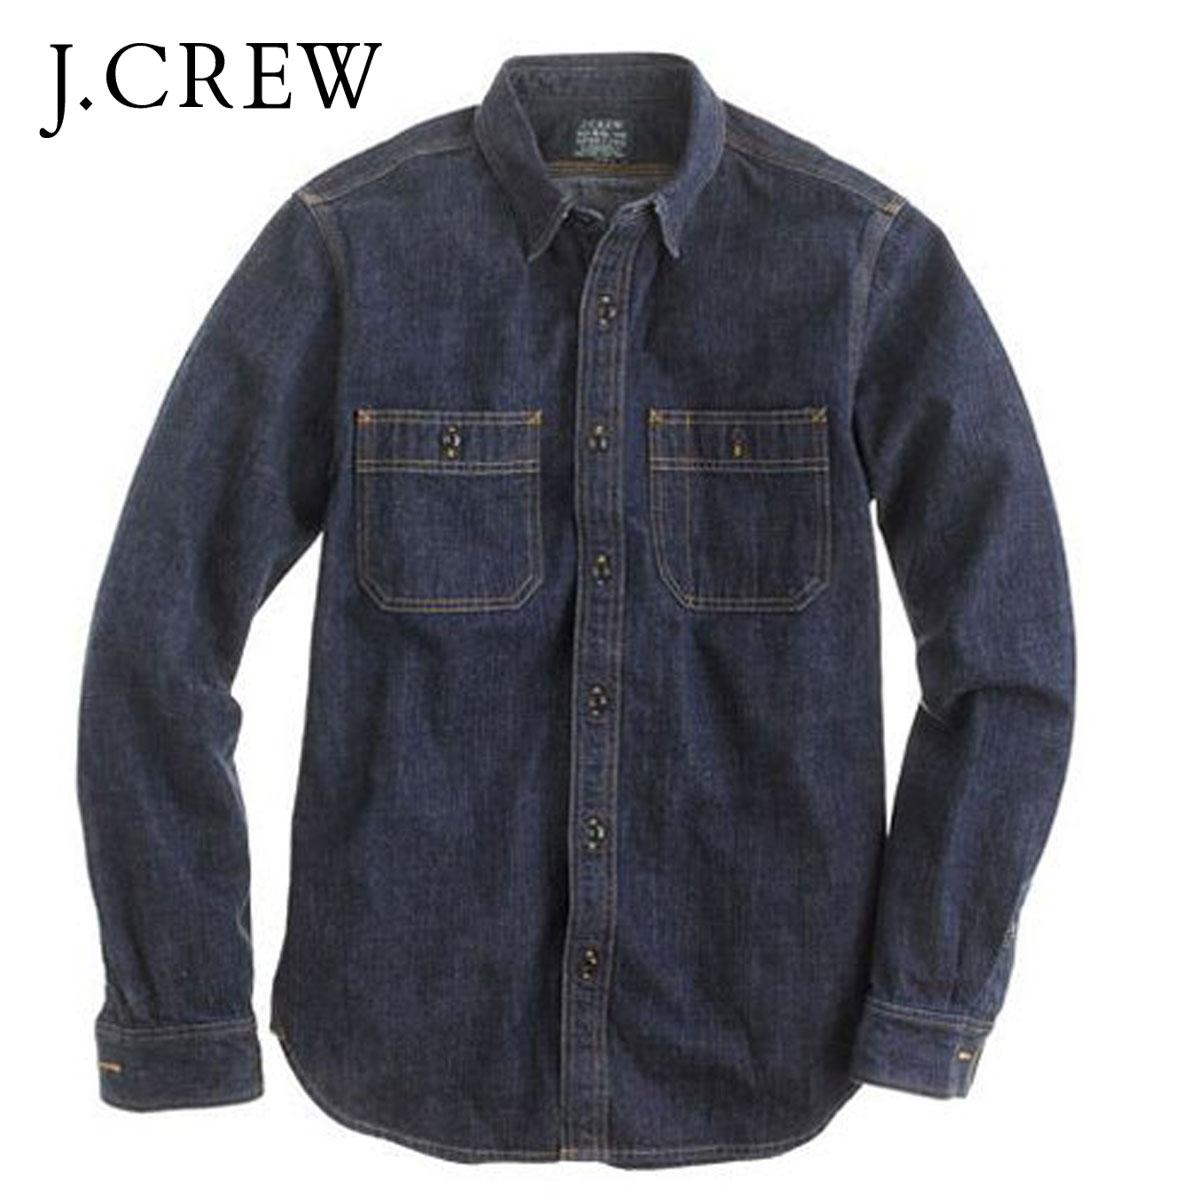 7194afe54ee3f Rakuten Ichiba shop MIXON  J.crew J.CREW AE men s long sleeve denim shirt  SELVEDGE INDIGO DENIM SHIRT 05040 NAVY 10P13Dec14